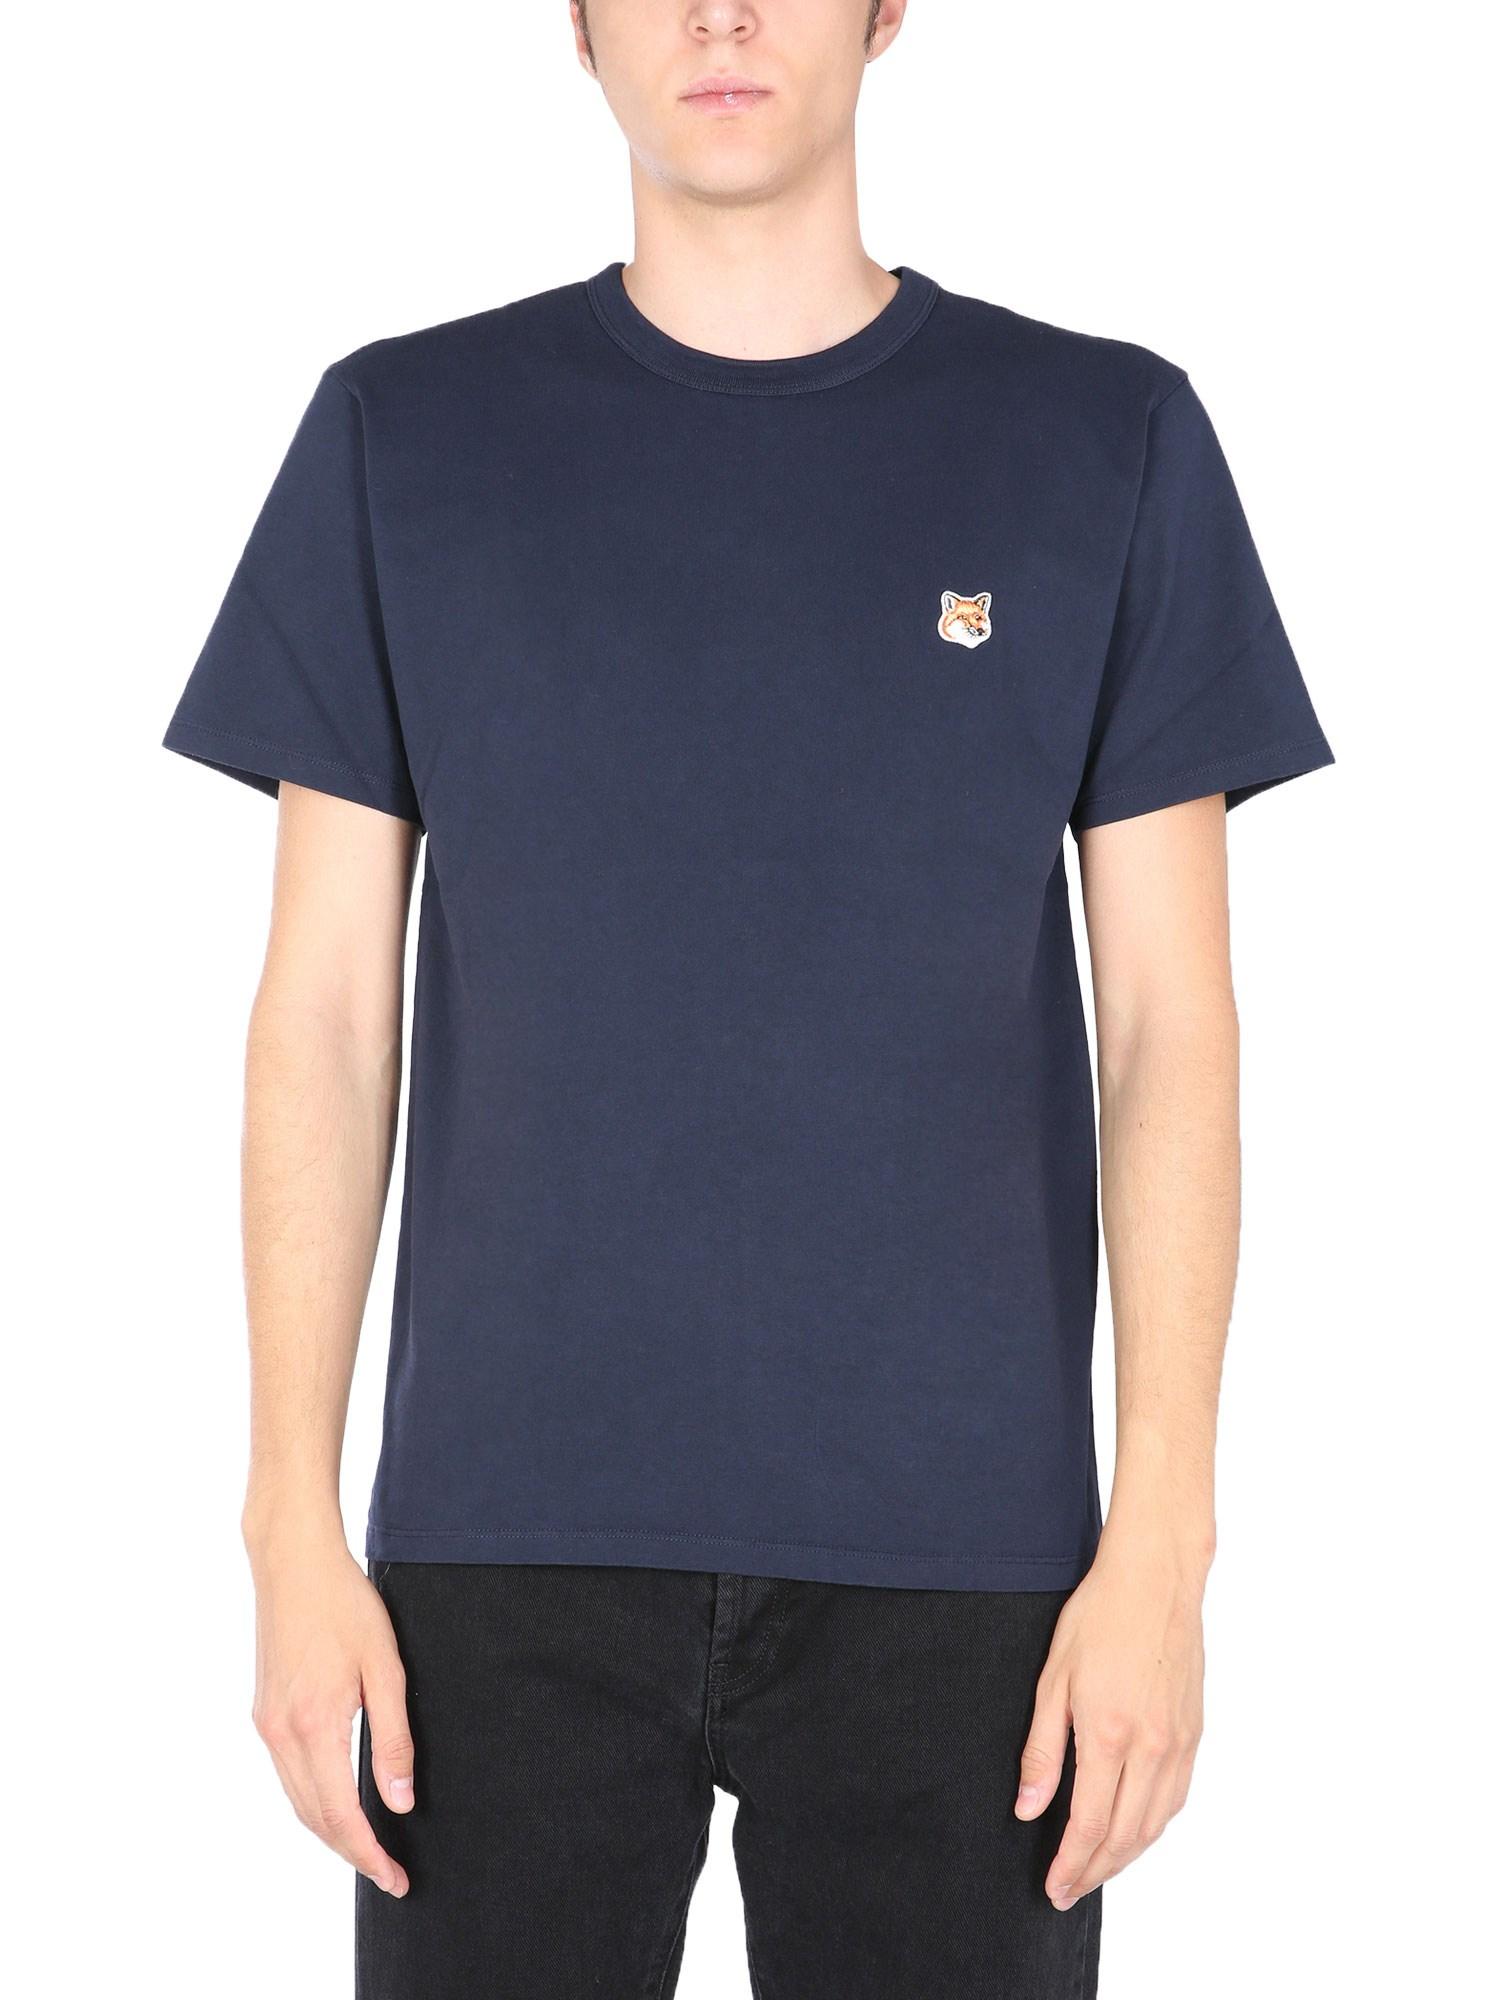 Maison kitsuné crew neck t-shirt - maison kitsuné - Modalova